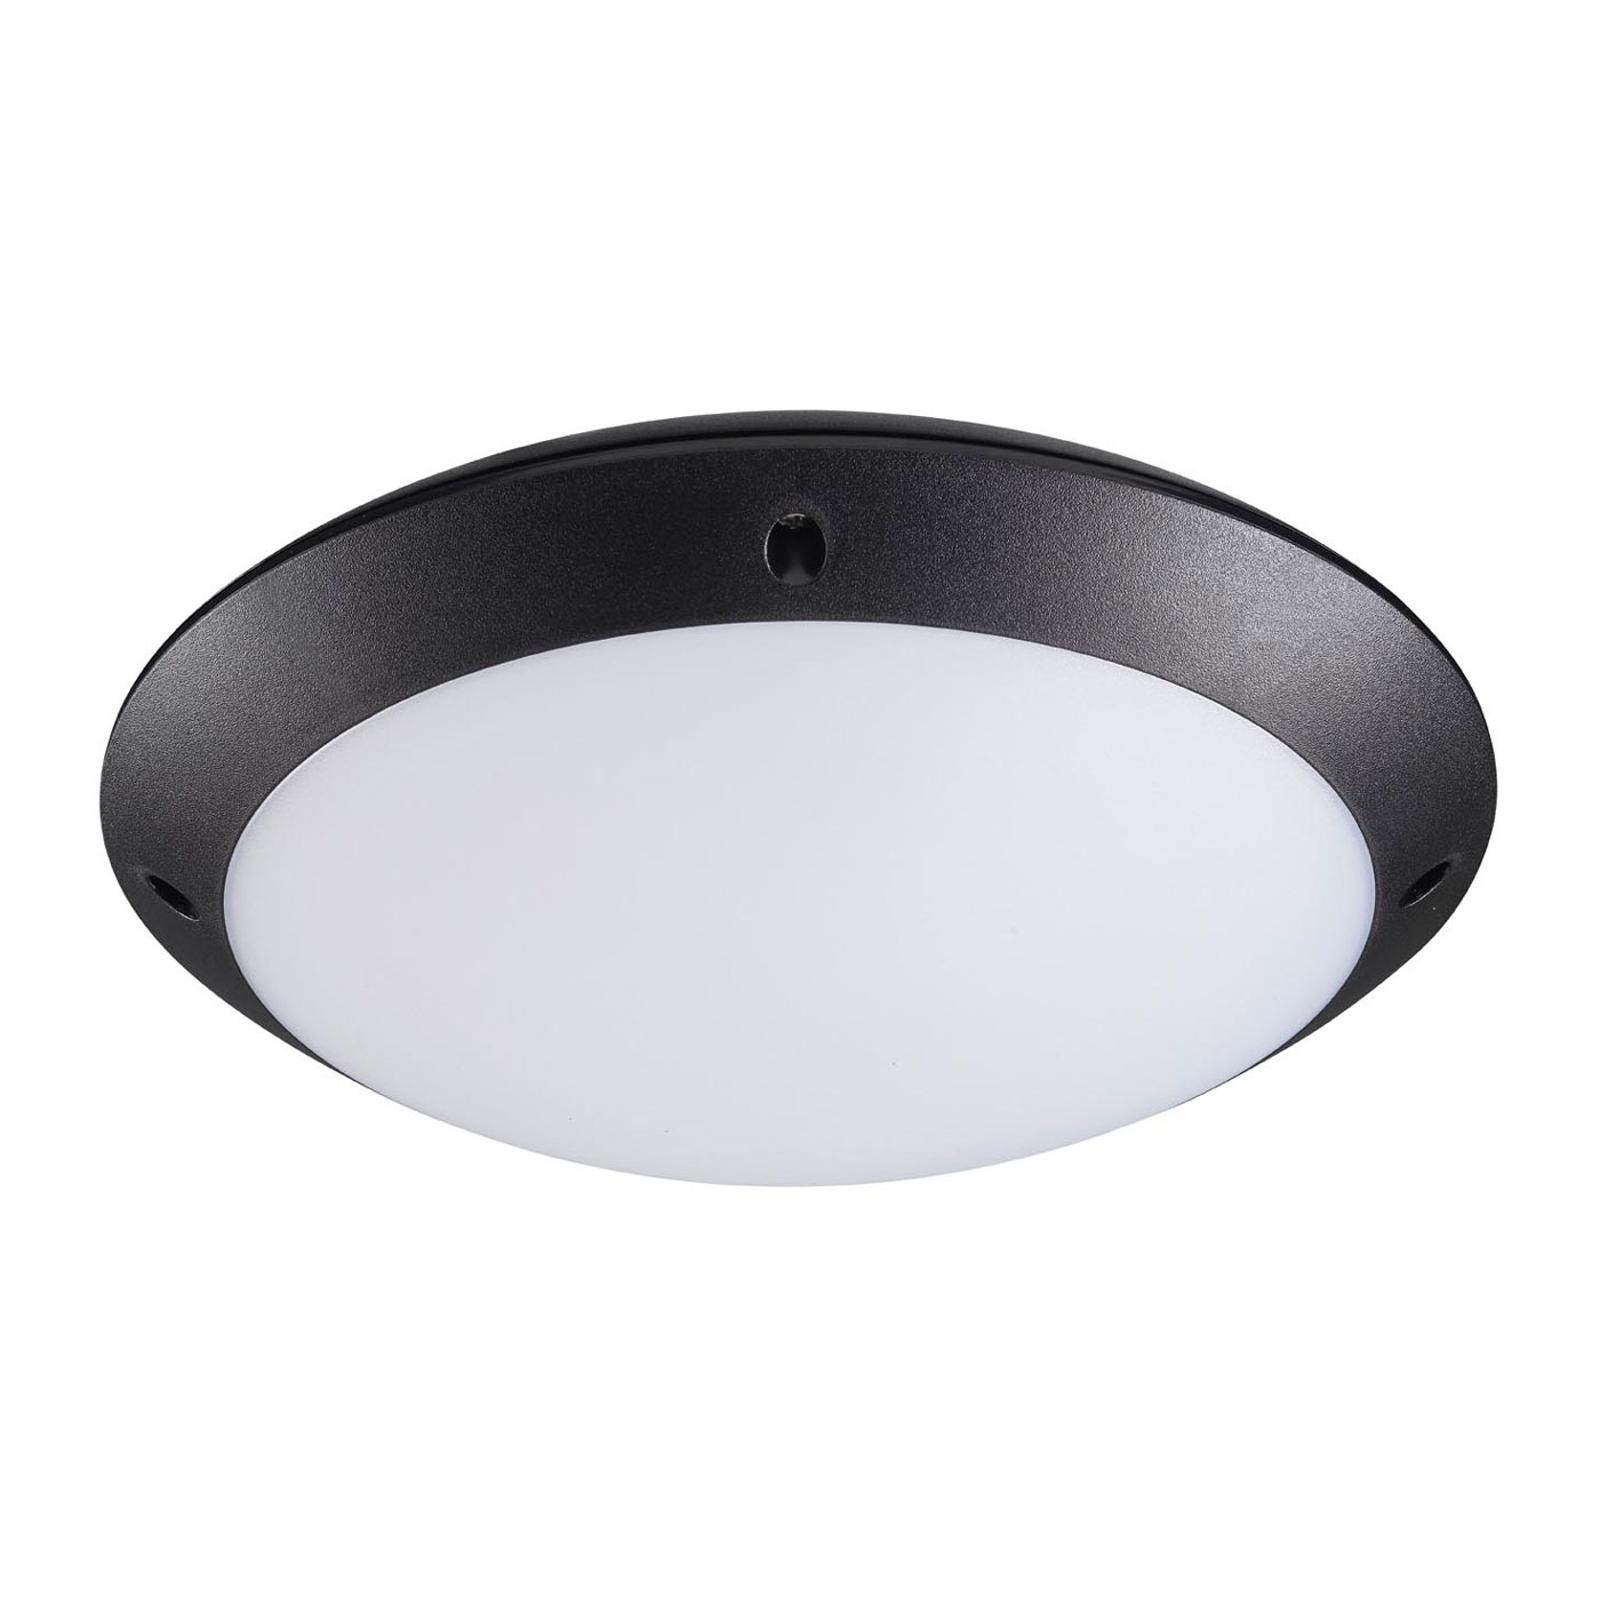 Sylvania Start plafondlamp SensorDim 4000K zwart